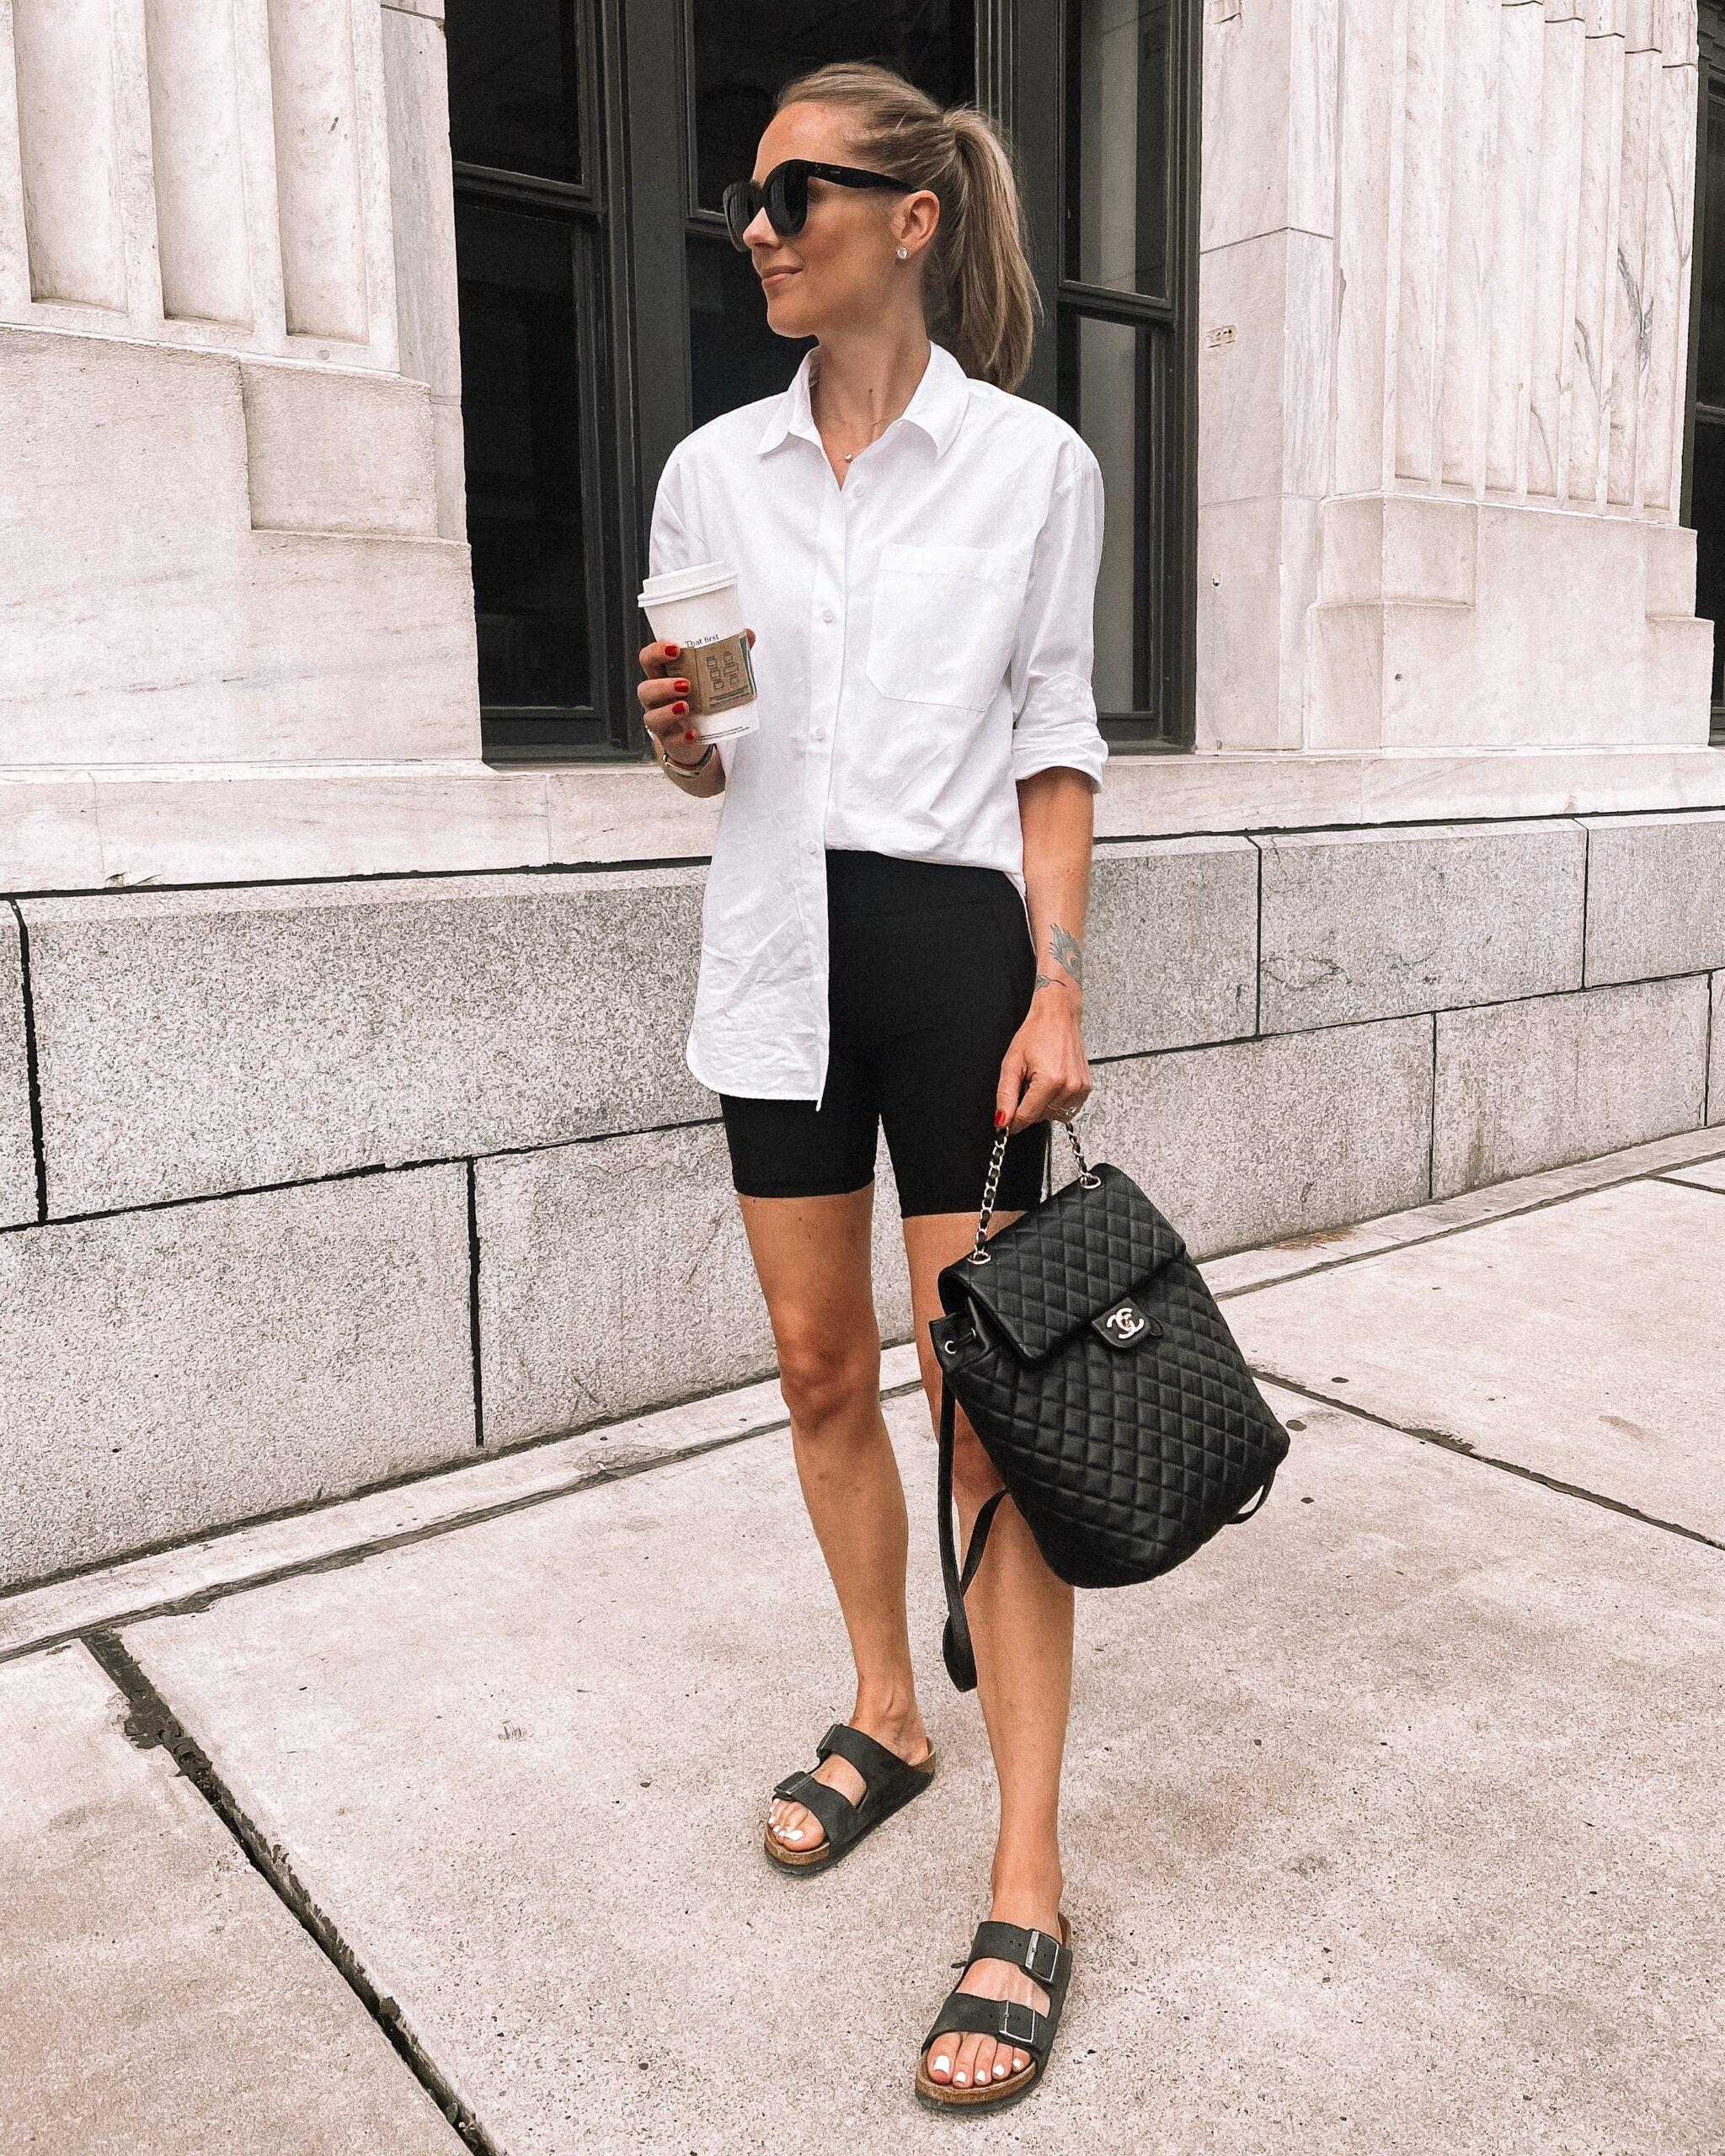 Fashion Jackson Wearing Jenni Kayne White Button Up Shirt lululemon Black Biker Shorts Blakc Birkenstock Sandals Chanel Black Backpack Summer Outfit 1